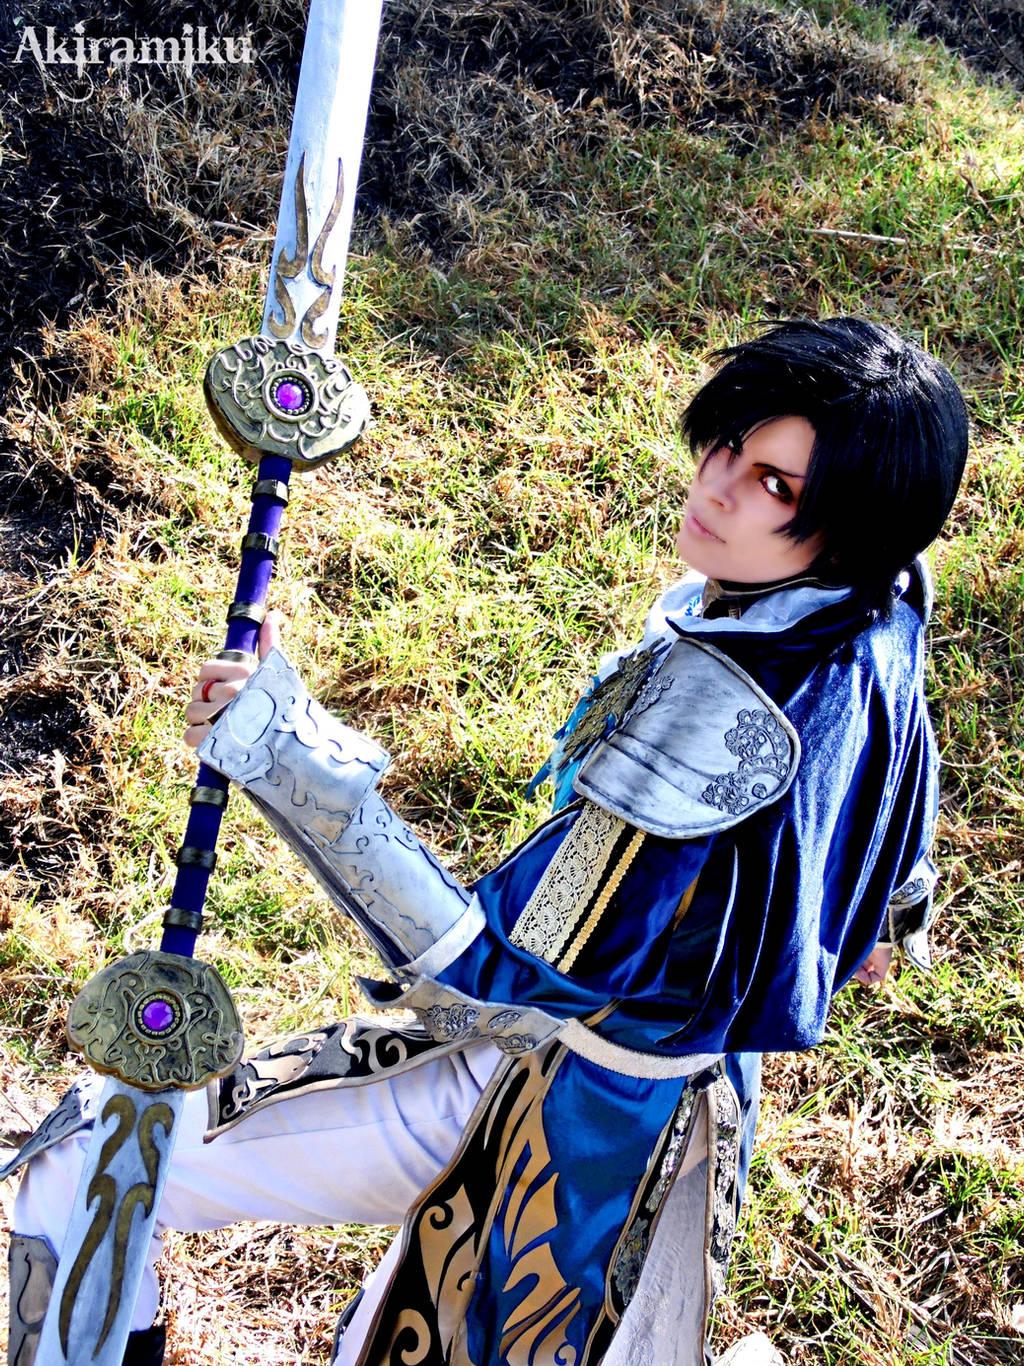 Cao pi Cosplay Dynasty Warriors 8 DW by akiramiku